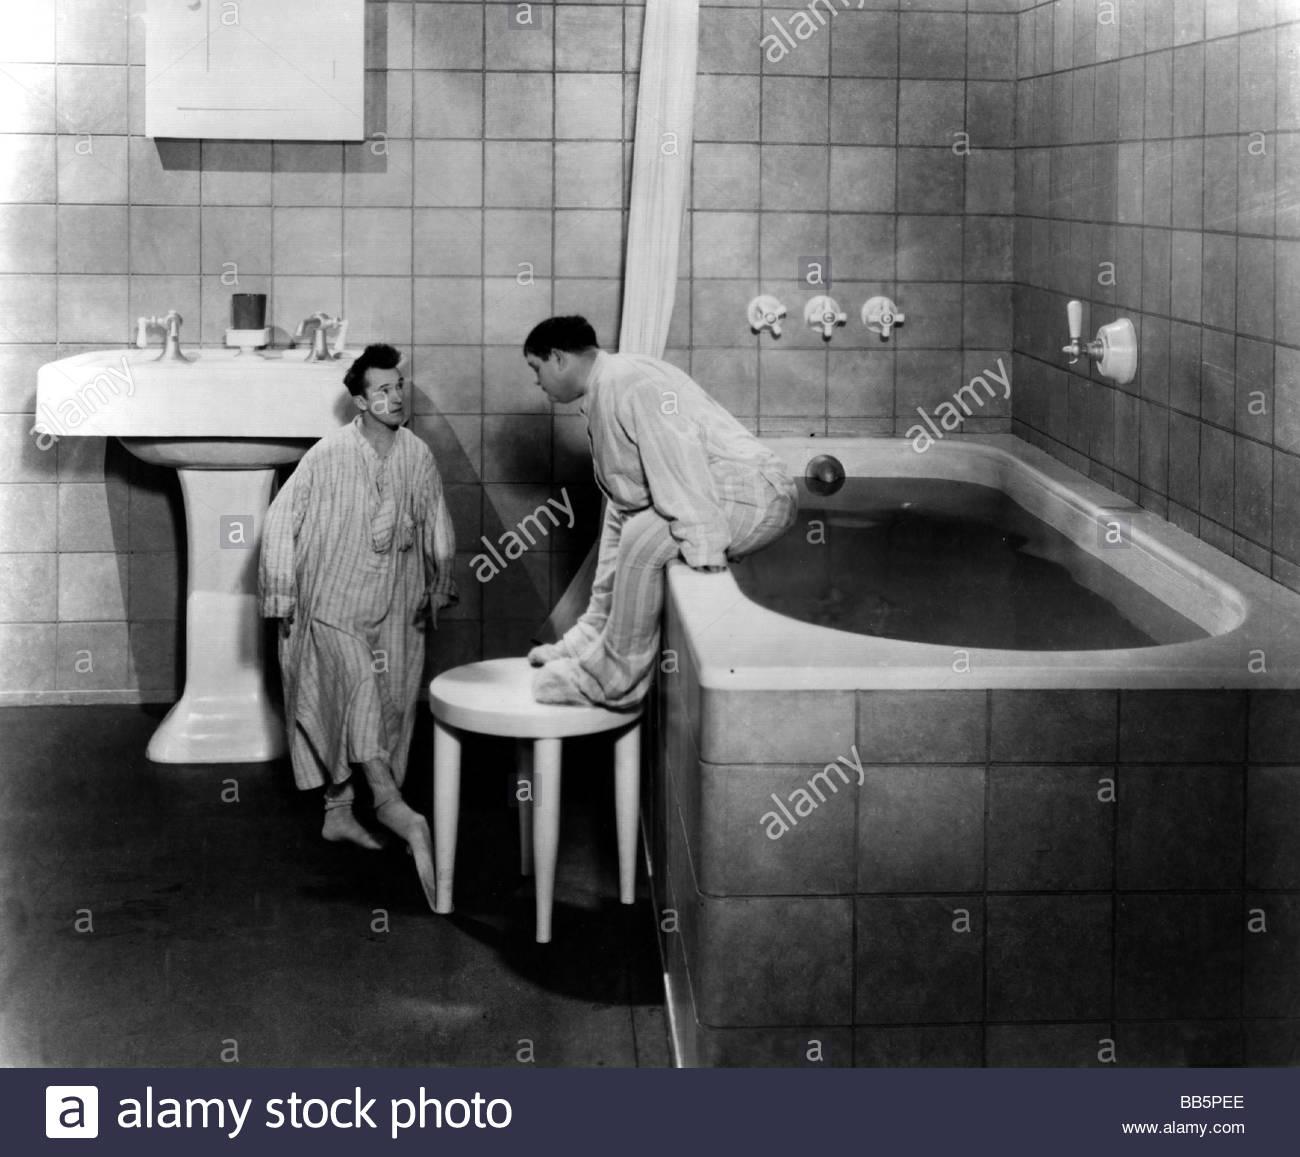 1930s Bathroom Movie Brats Usa 1930s Director James Parrott Scene With